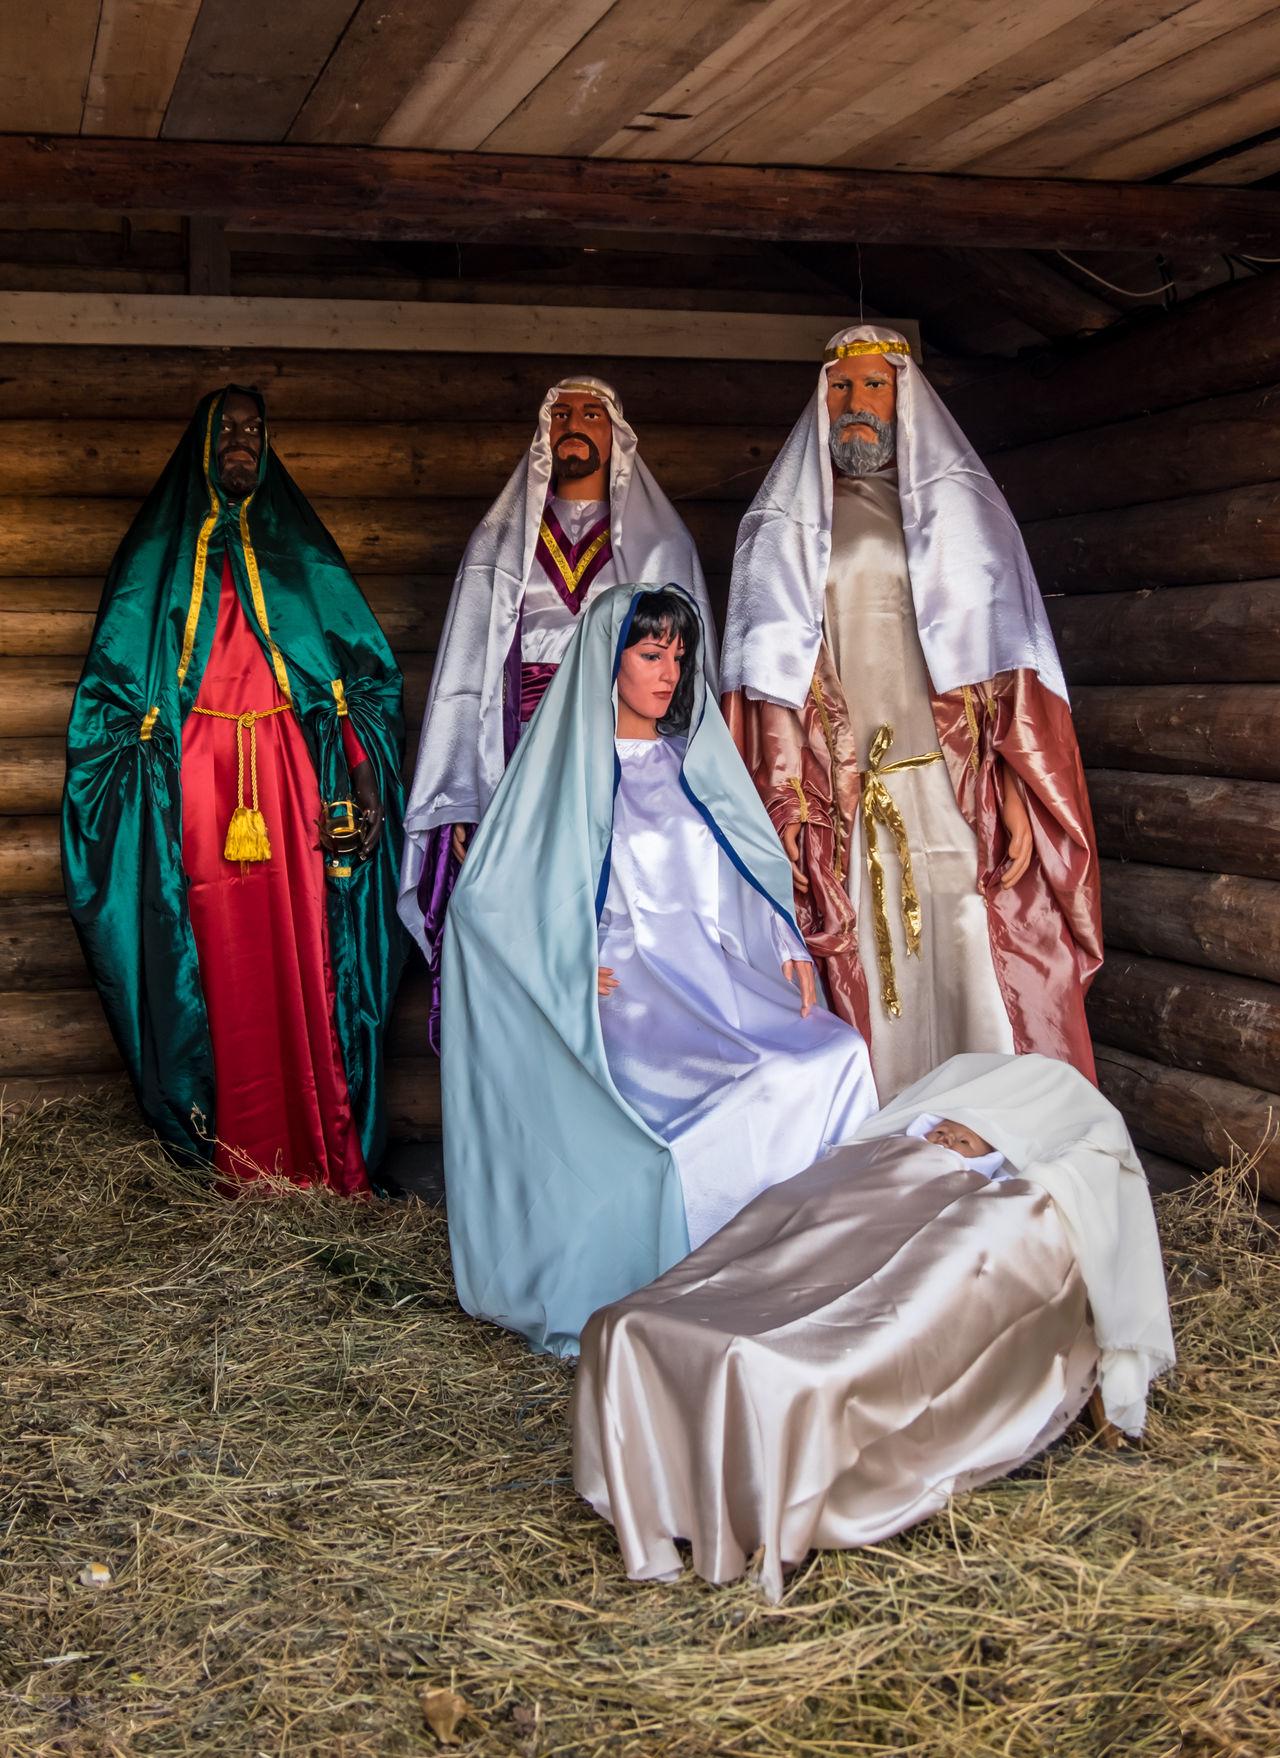 Christmas nativity scene with figures, including Jesus, Mary, Joseph and the Magi. Born Chatolic Christian Christmas Cildren Figurine  Holy Jesus Joseph Mary Nativity Nativity Scene Saint Scene